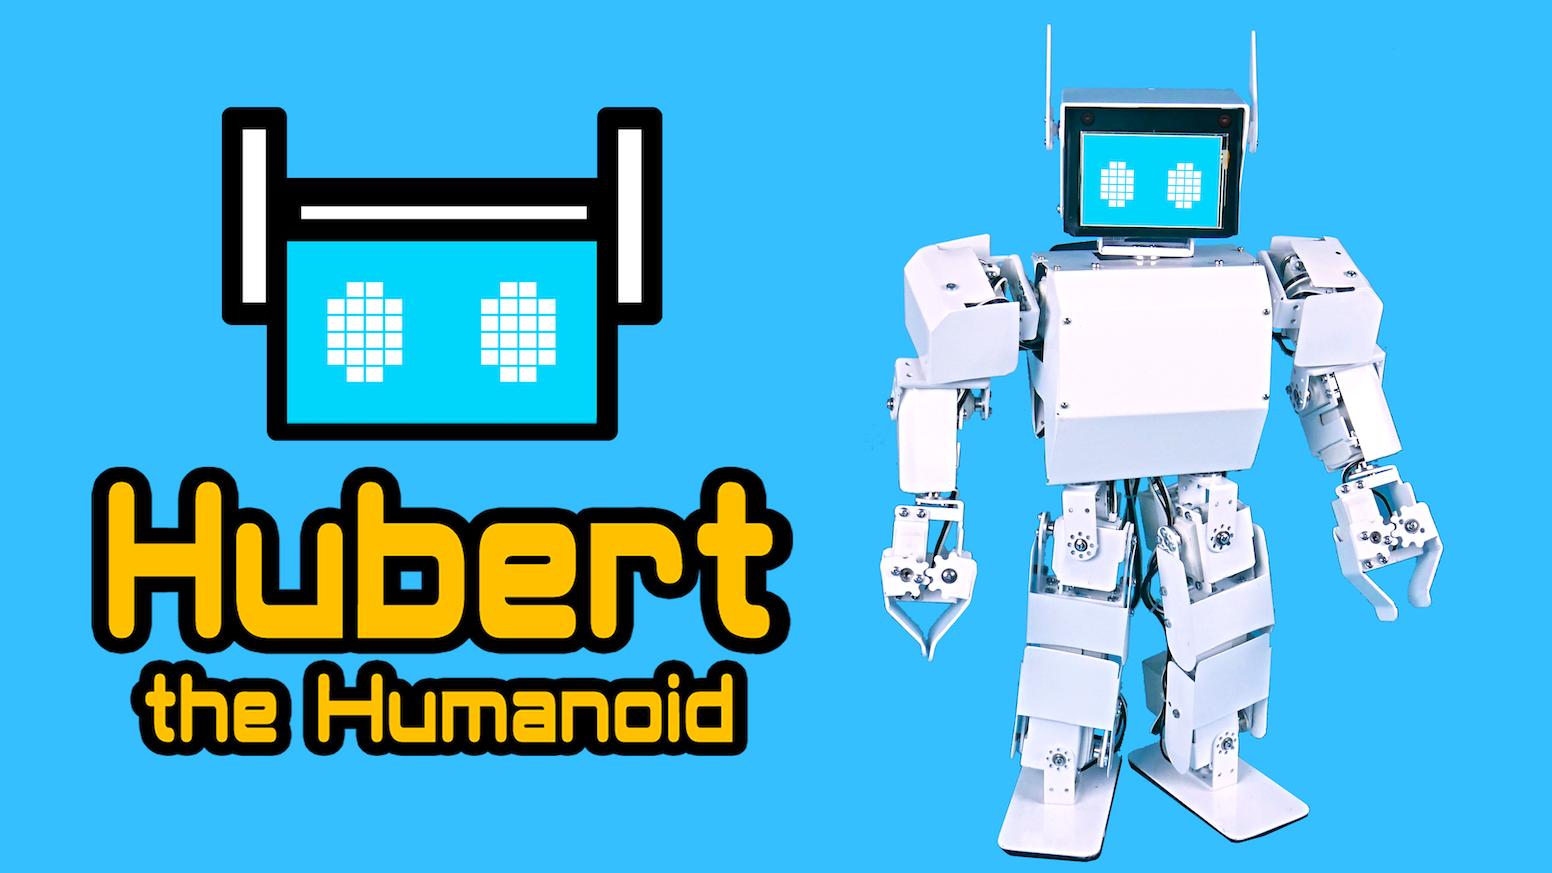 Hubert the Humanoid: Your Advanced Robotics Study Buddy by